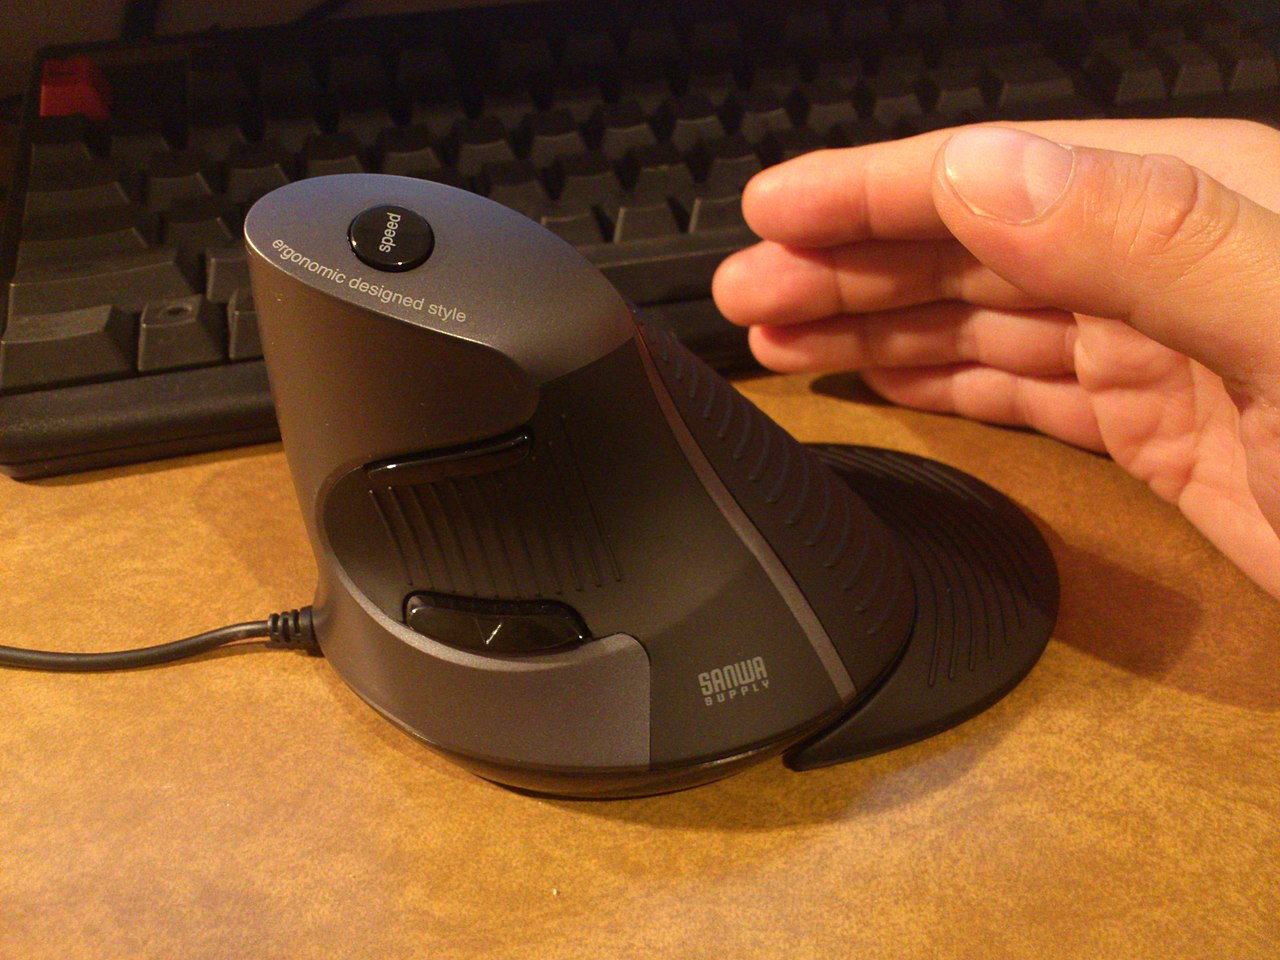 An ergonomic mouse.